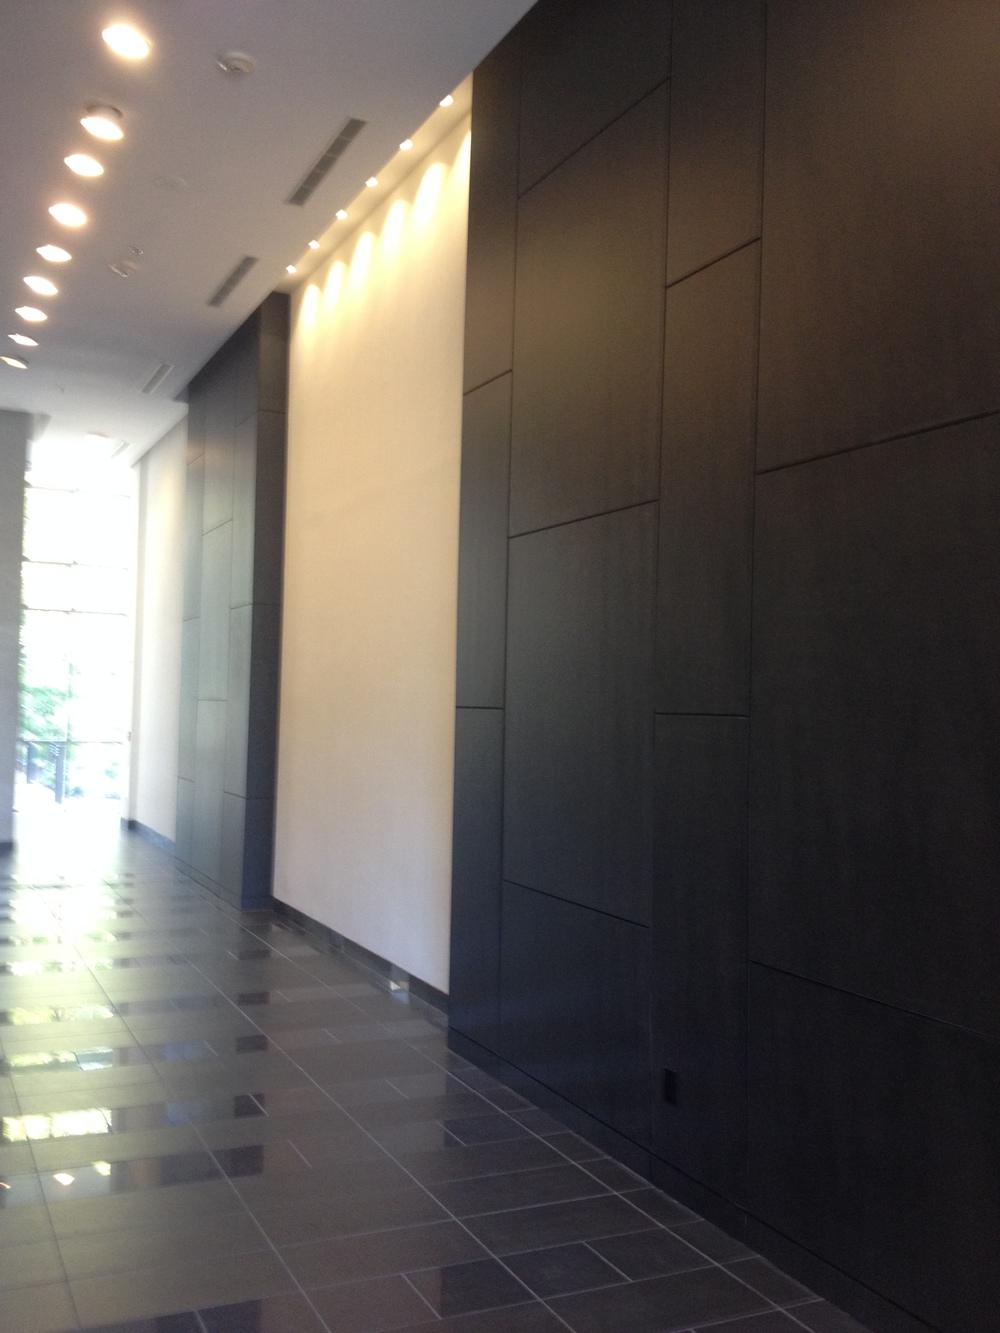 In Progress -North Lobby Elevator